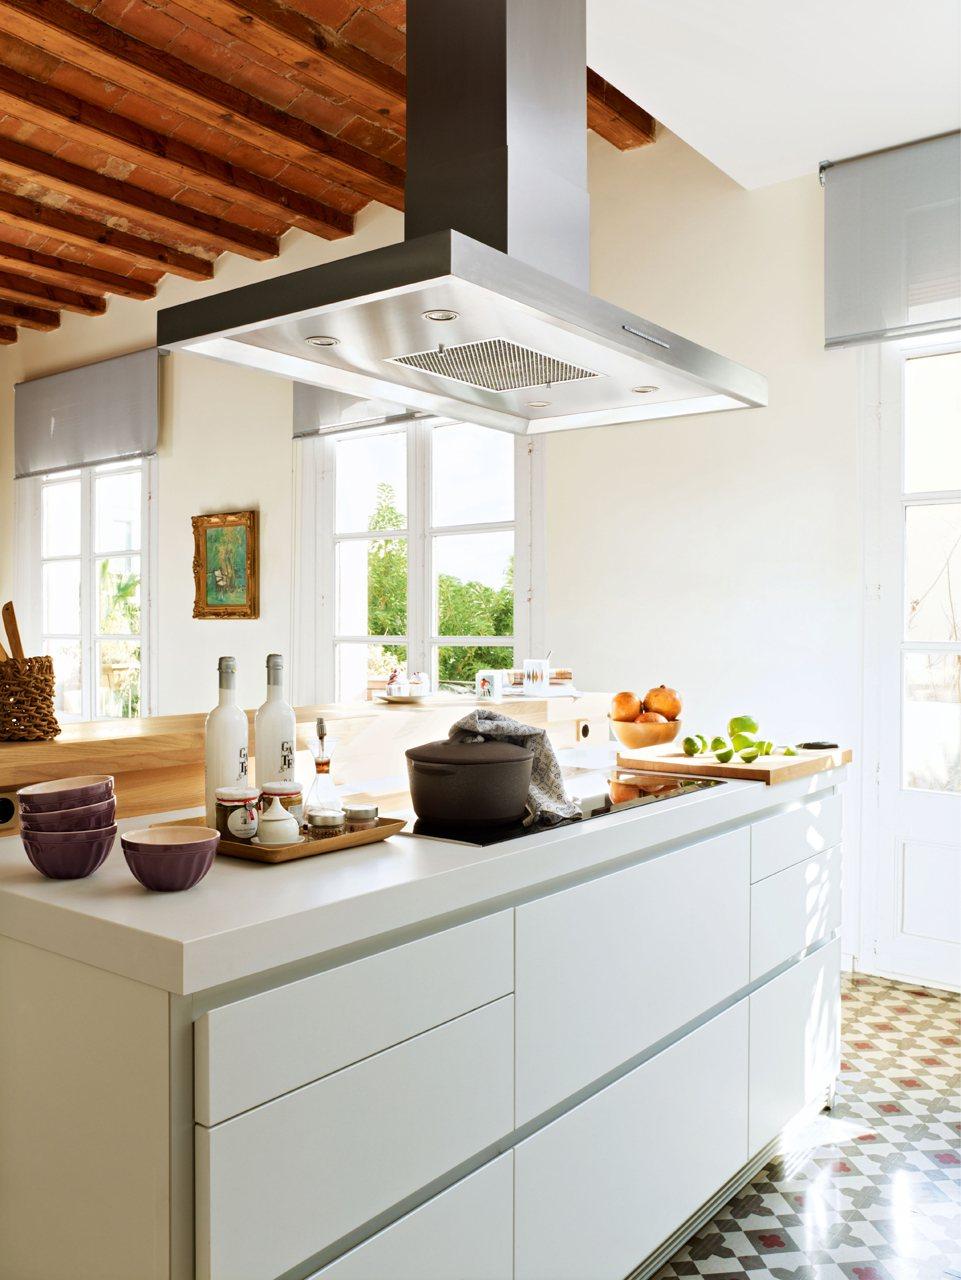 10 piezas m gicas para renovar la casa for Lista de utiles de cocina